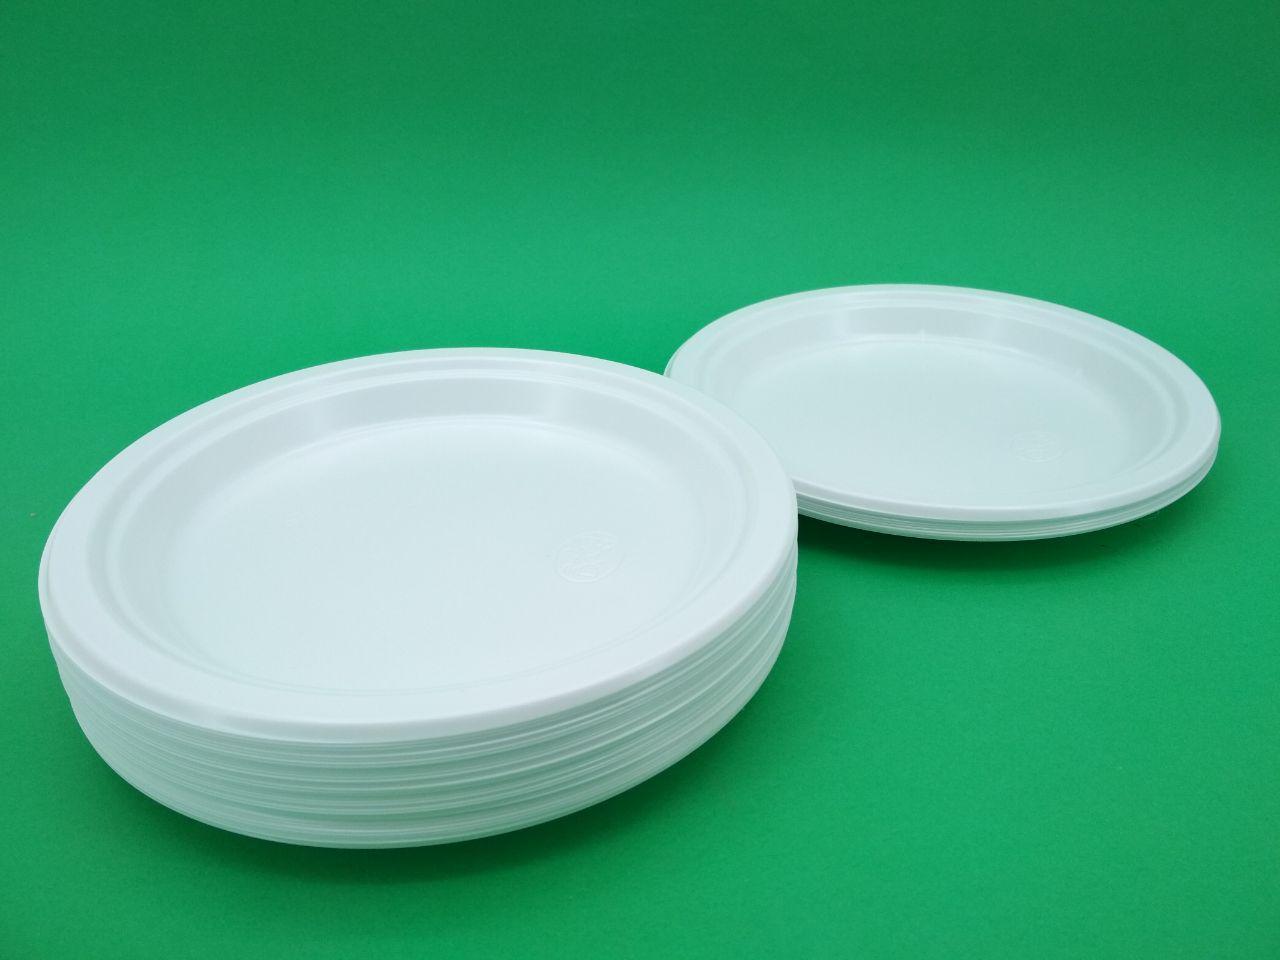 Тарелка одноразовая пластиковая 220 mm белая (50 шт)